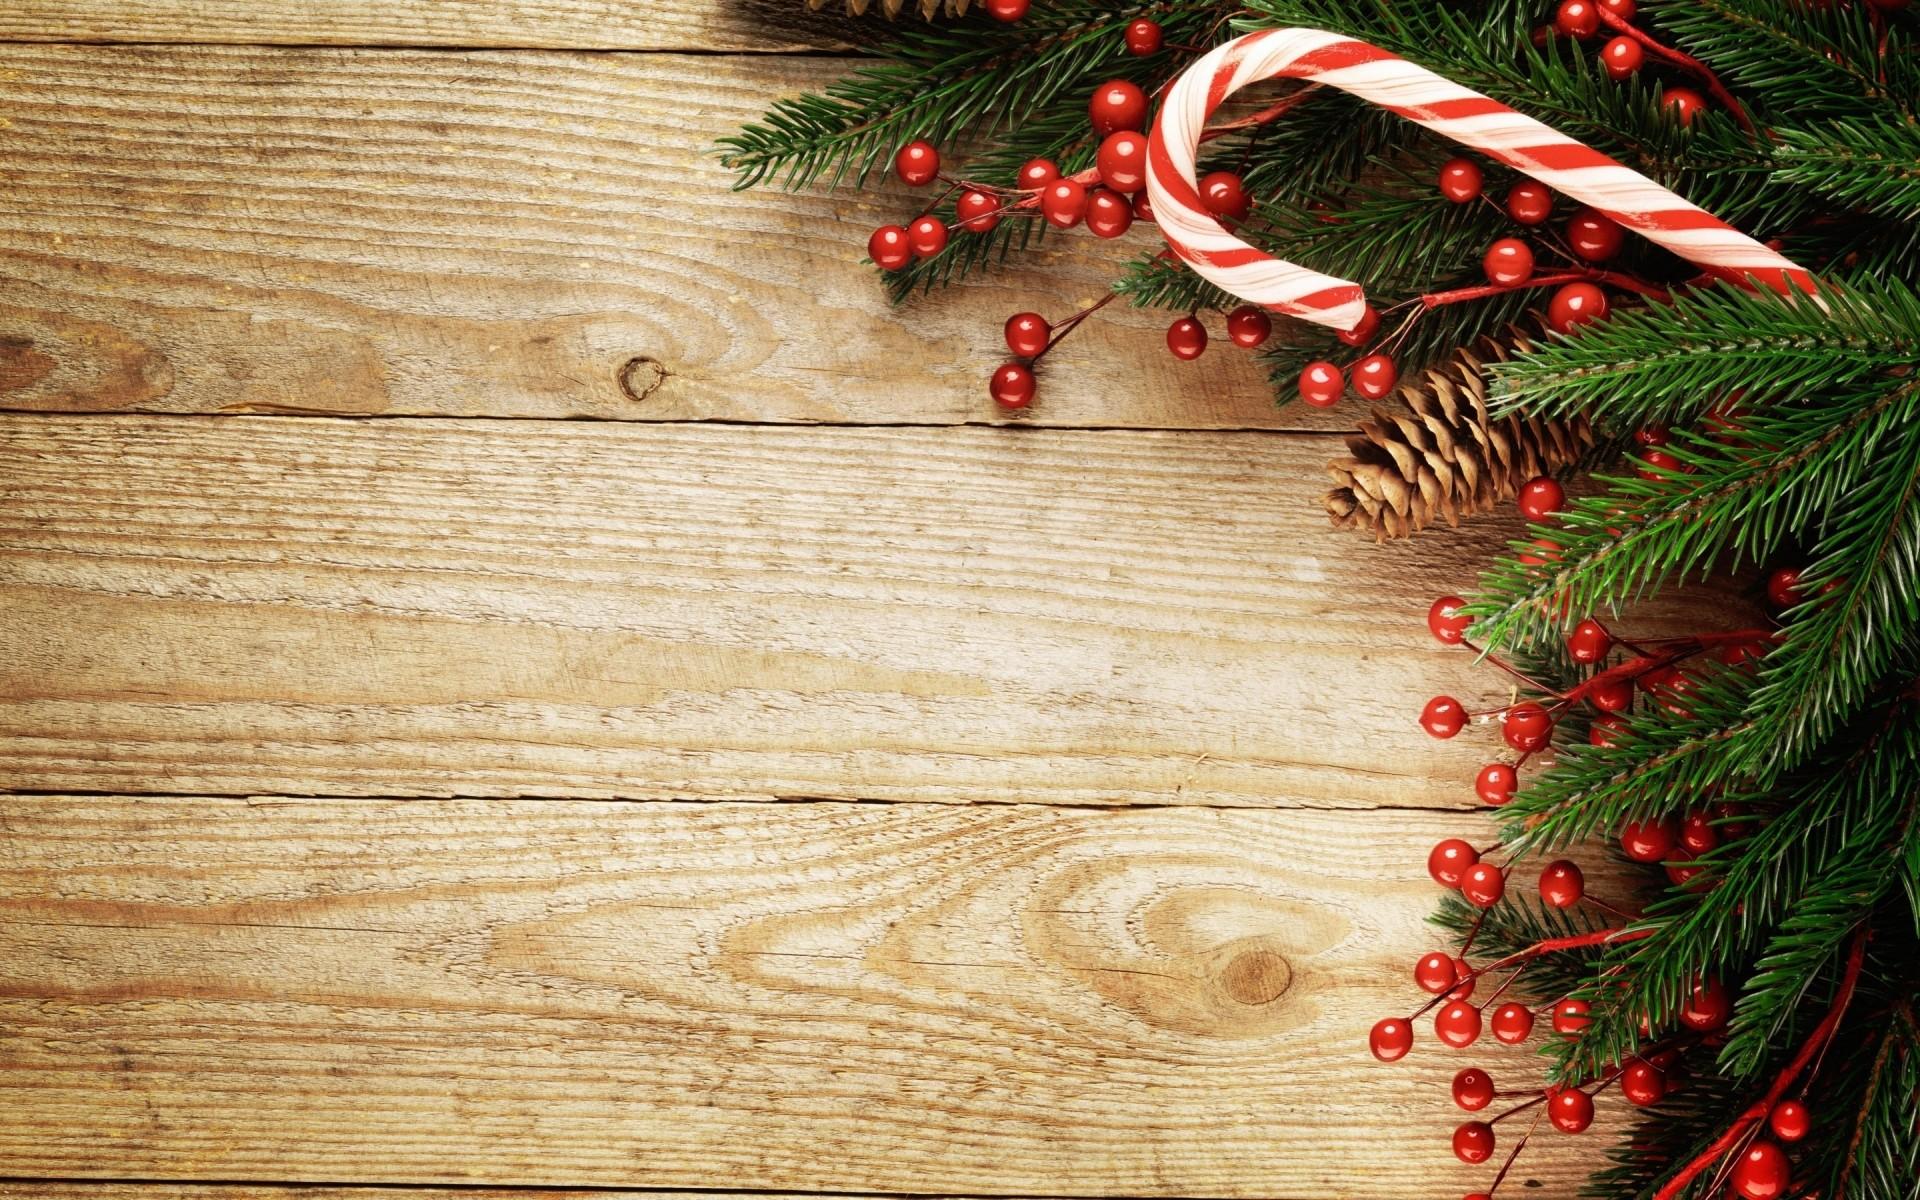 Christmas Pine Wood Wooden Decoration Winter Desktop Celebration Fir Rustic Merry Ball Interior Design Tree Retro